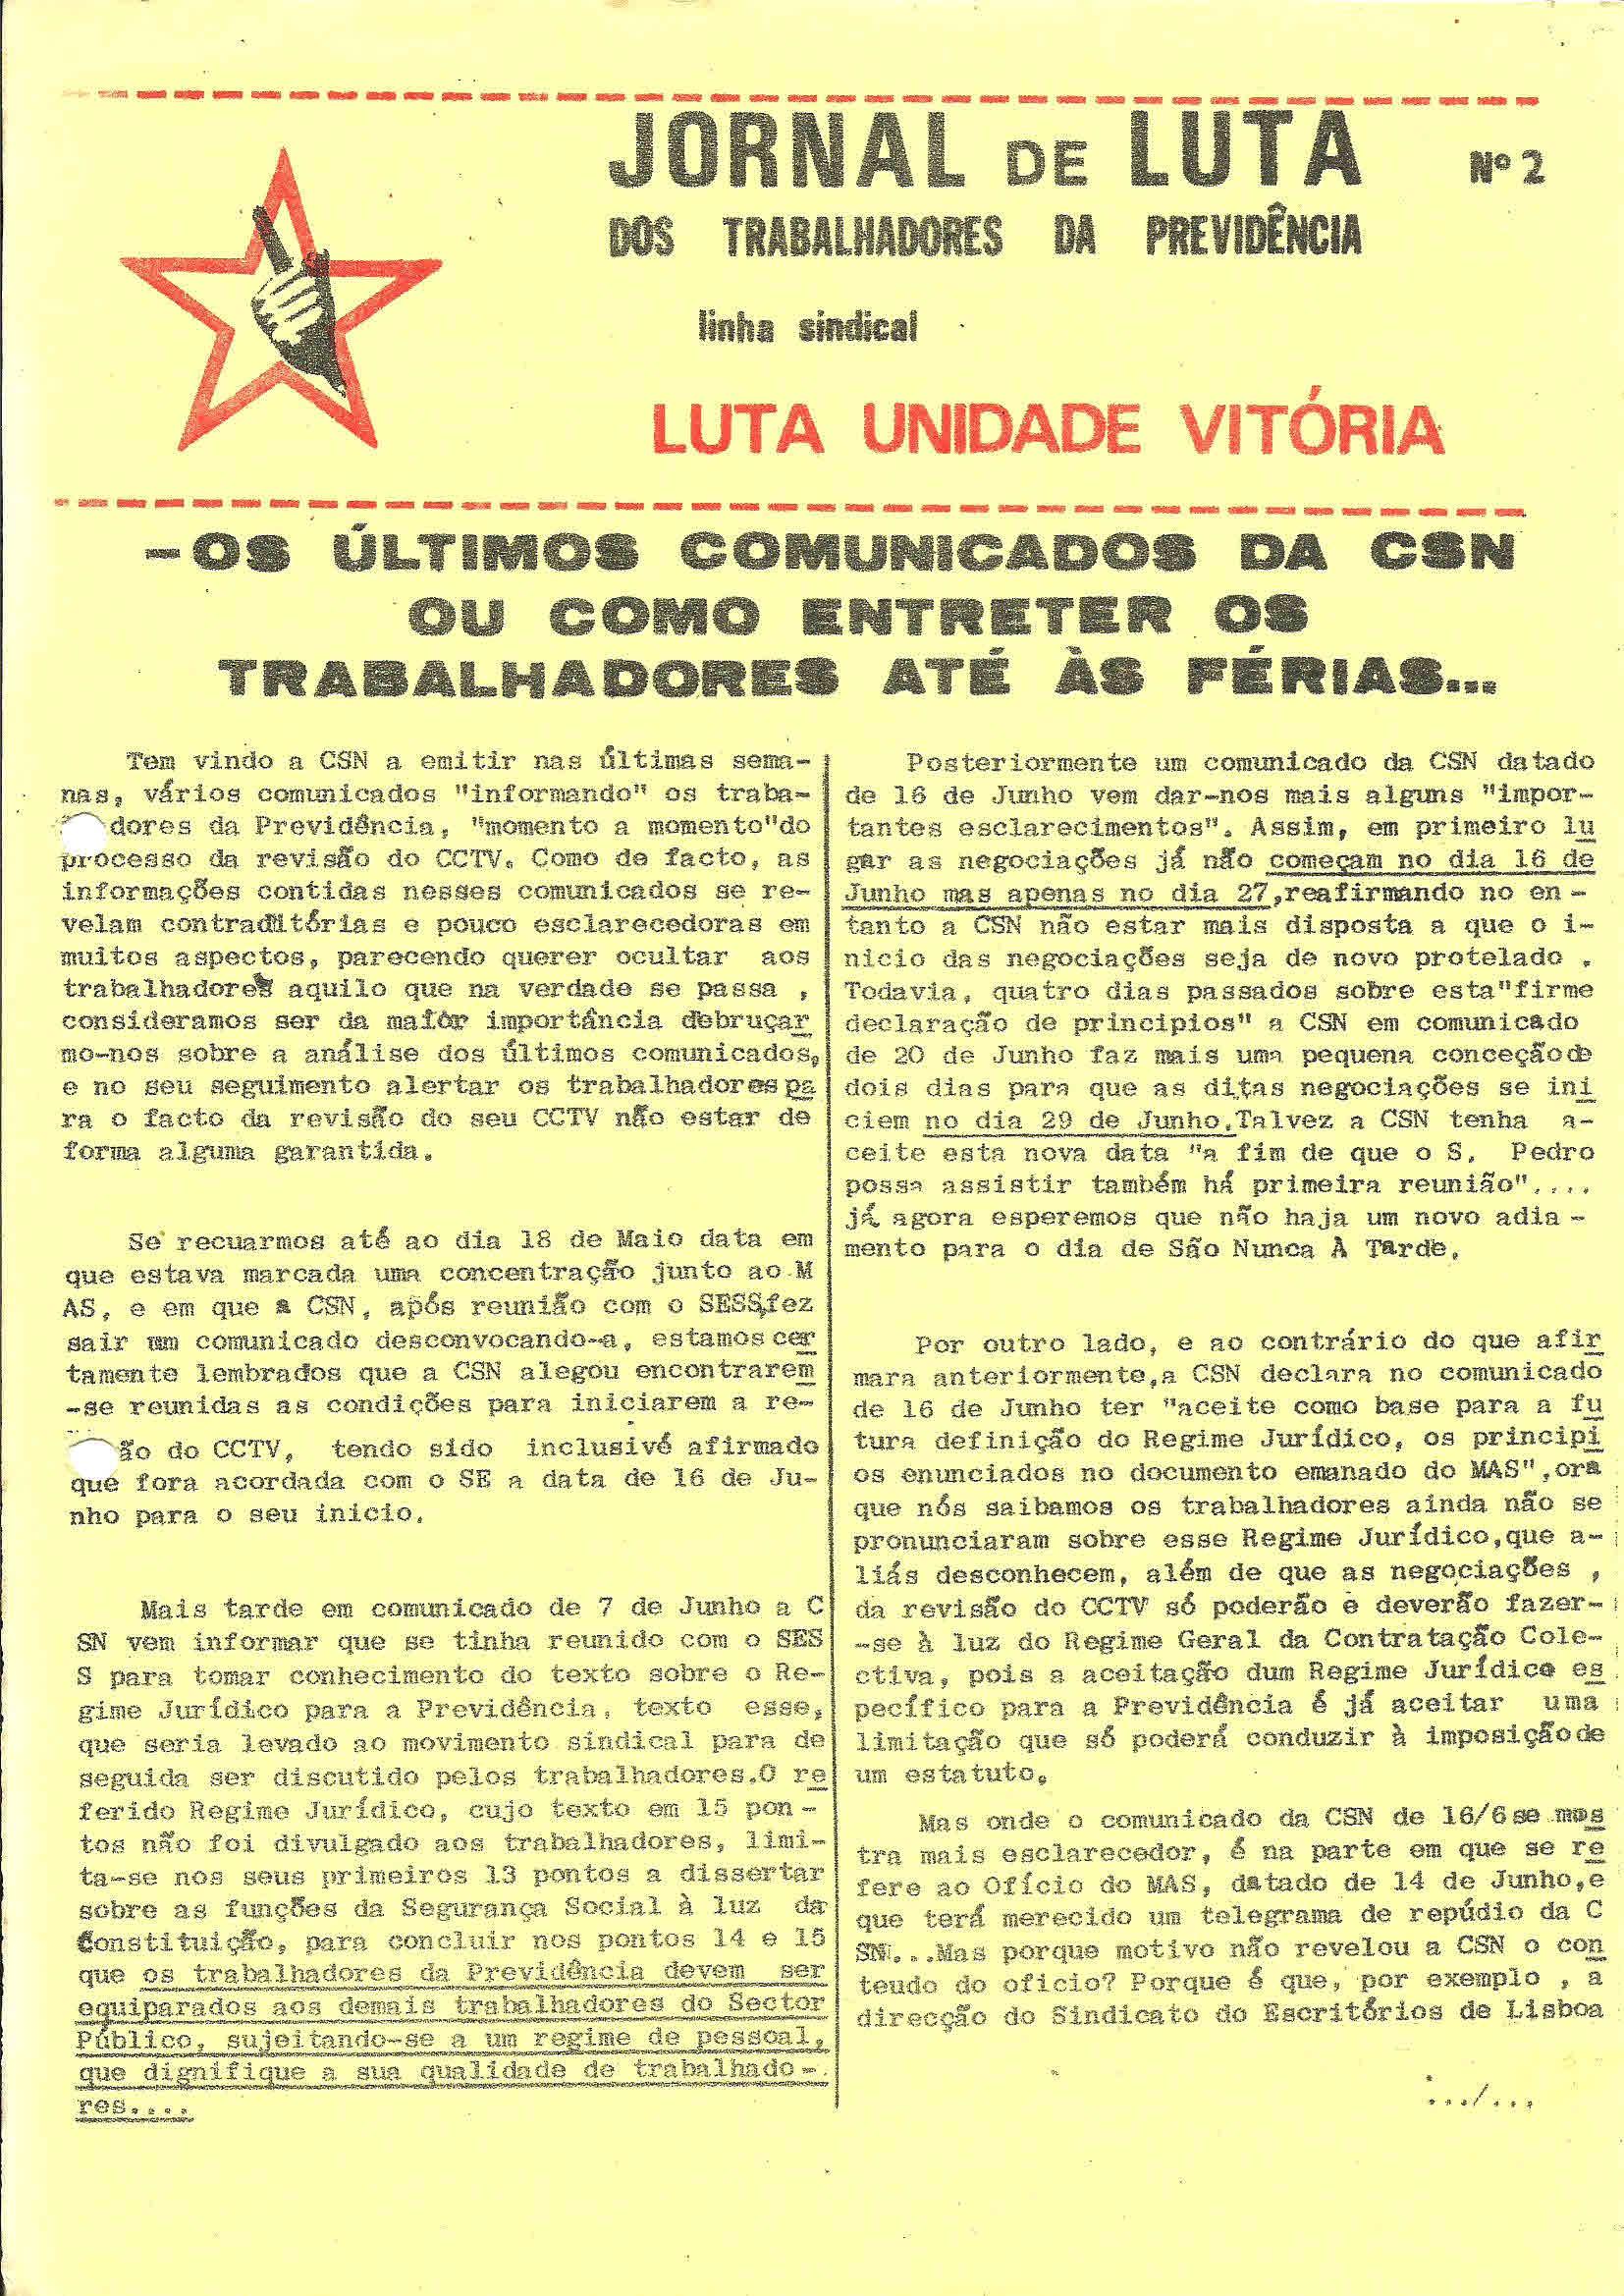 1 Sind Trab Previdência Jornal de Luta n 2 Junho 1977 1